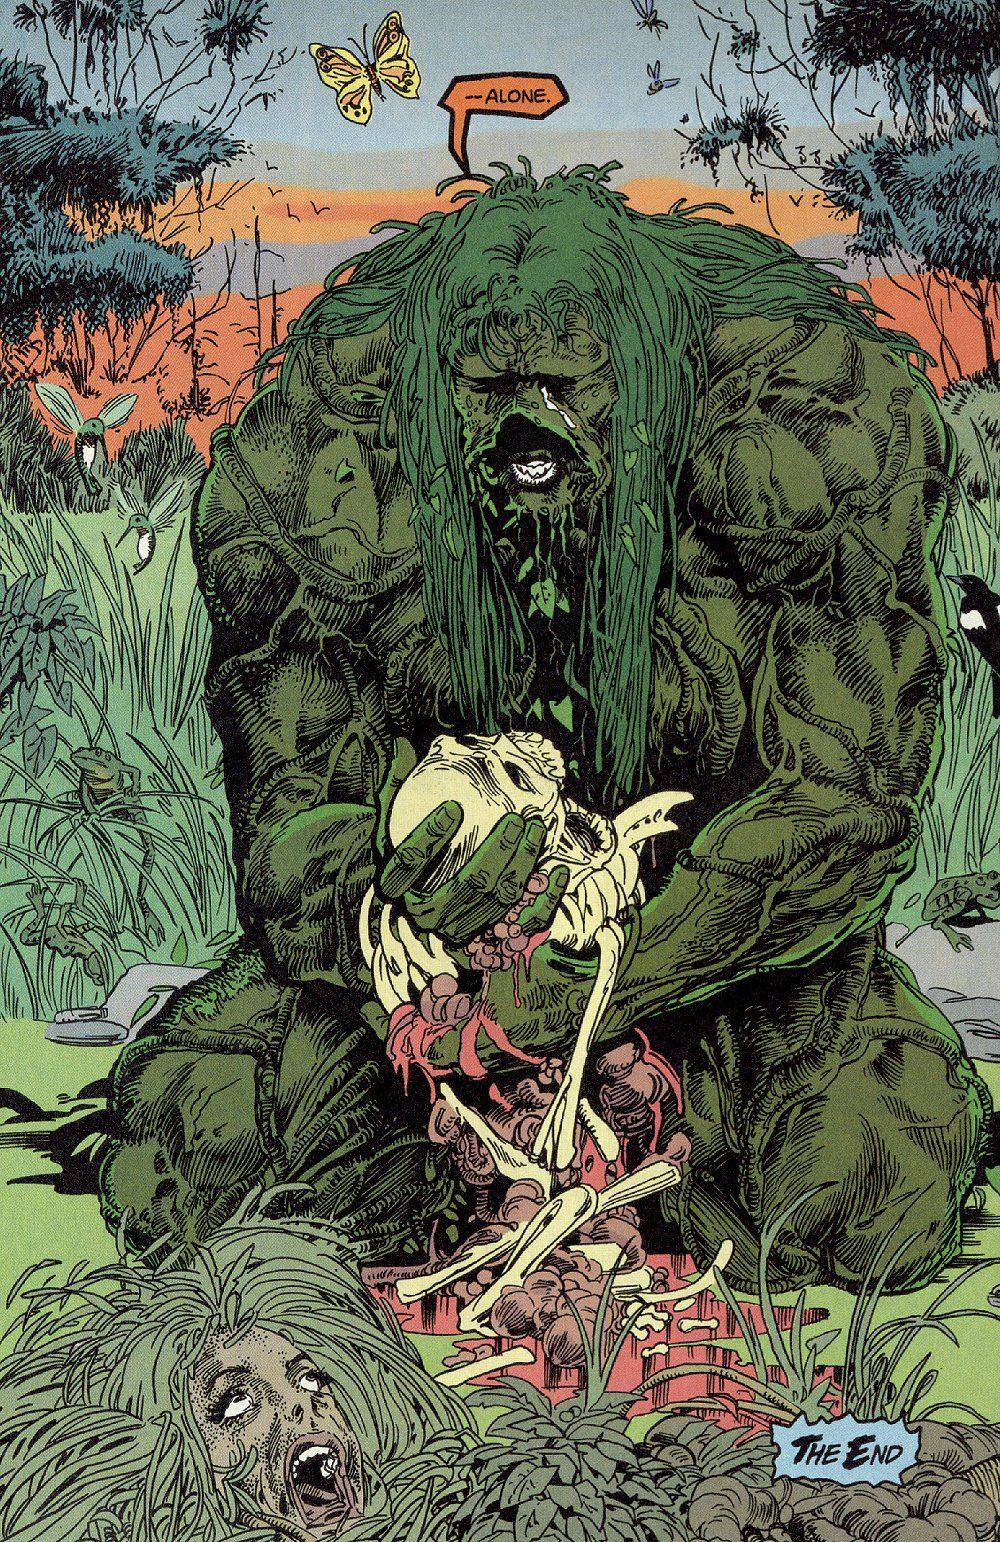 Swamp Thing 0023 Jpg Jpeg Image 1000 1542 Pixels Scaled 59 Dc Comics Art Horror Art Comic Art